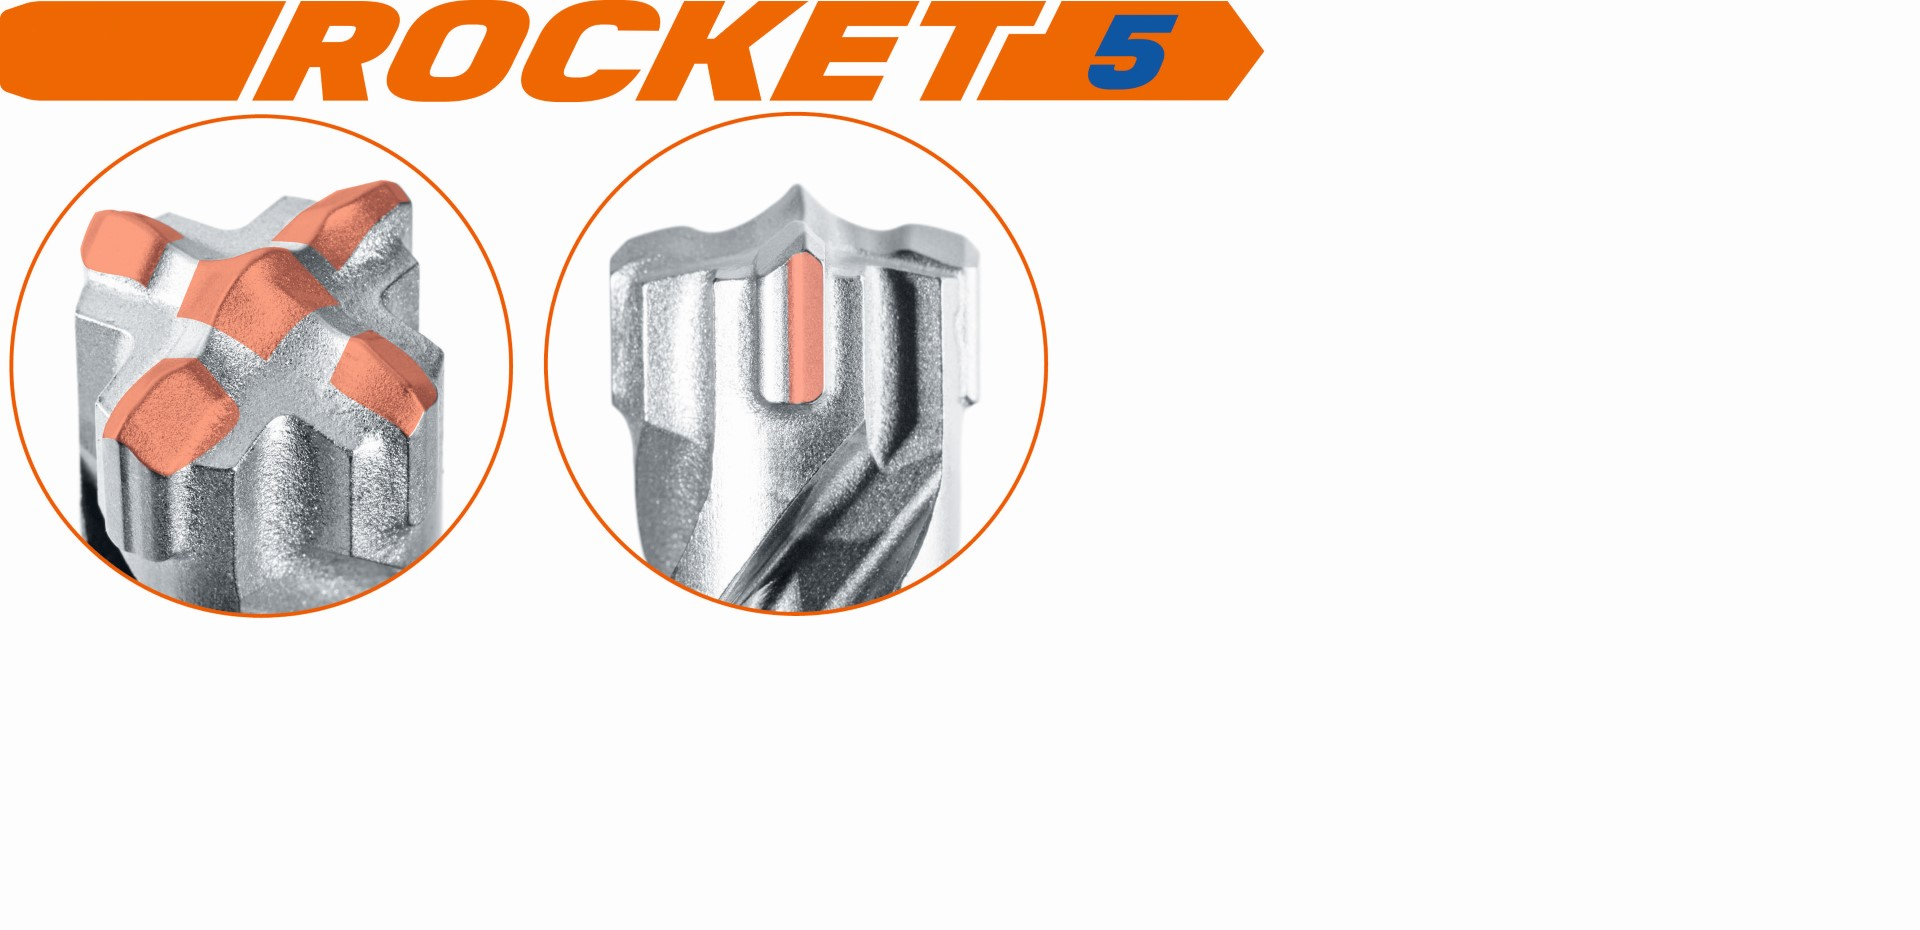 Slika BORER Rocket 5 SDS-plus 12x260mm 4-kraka